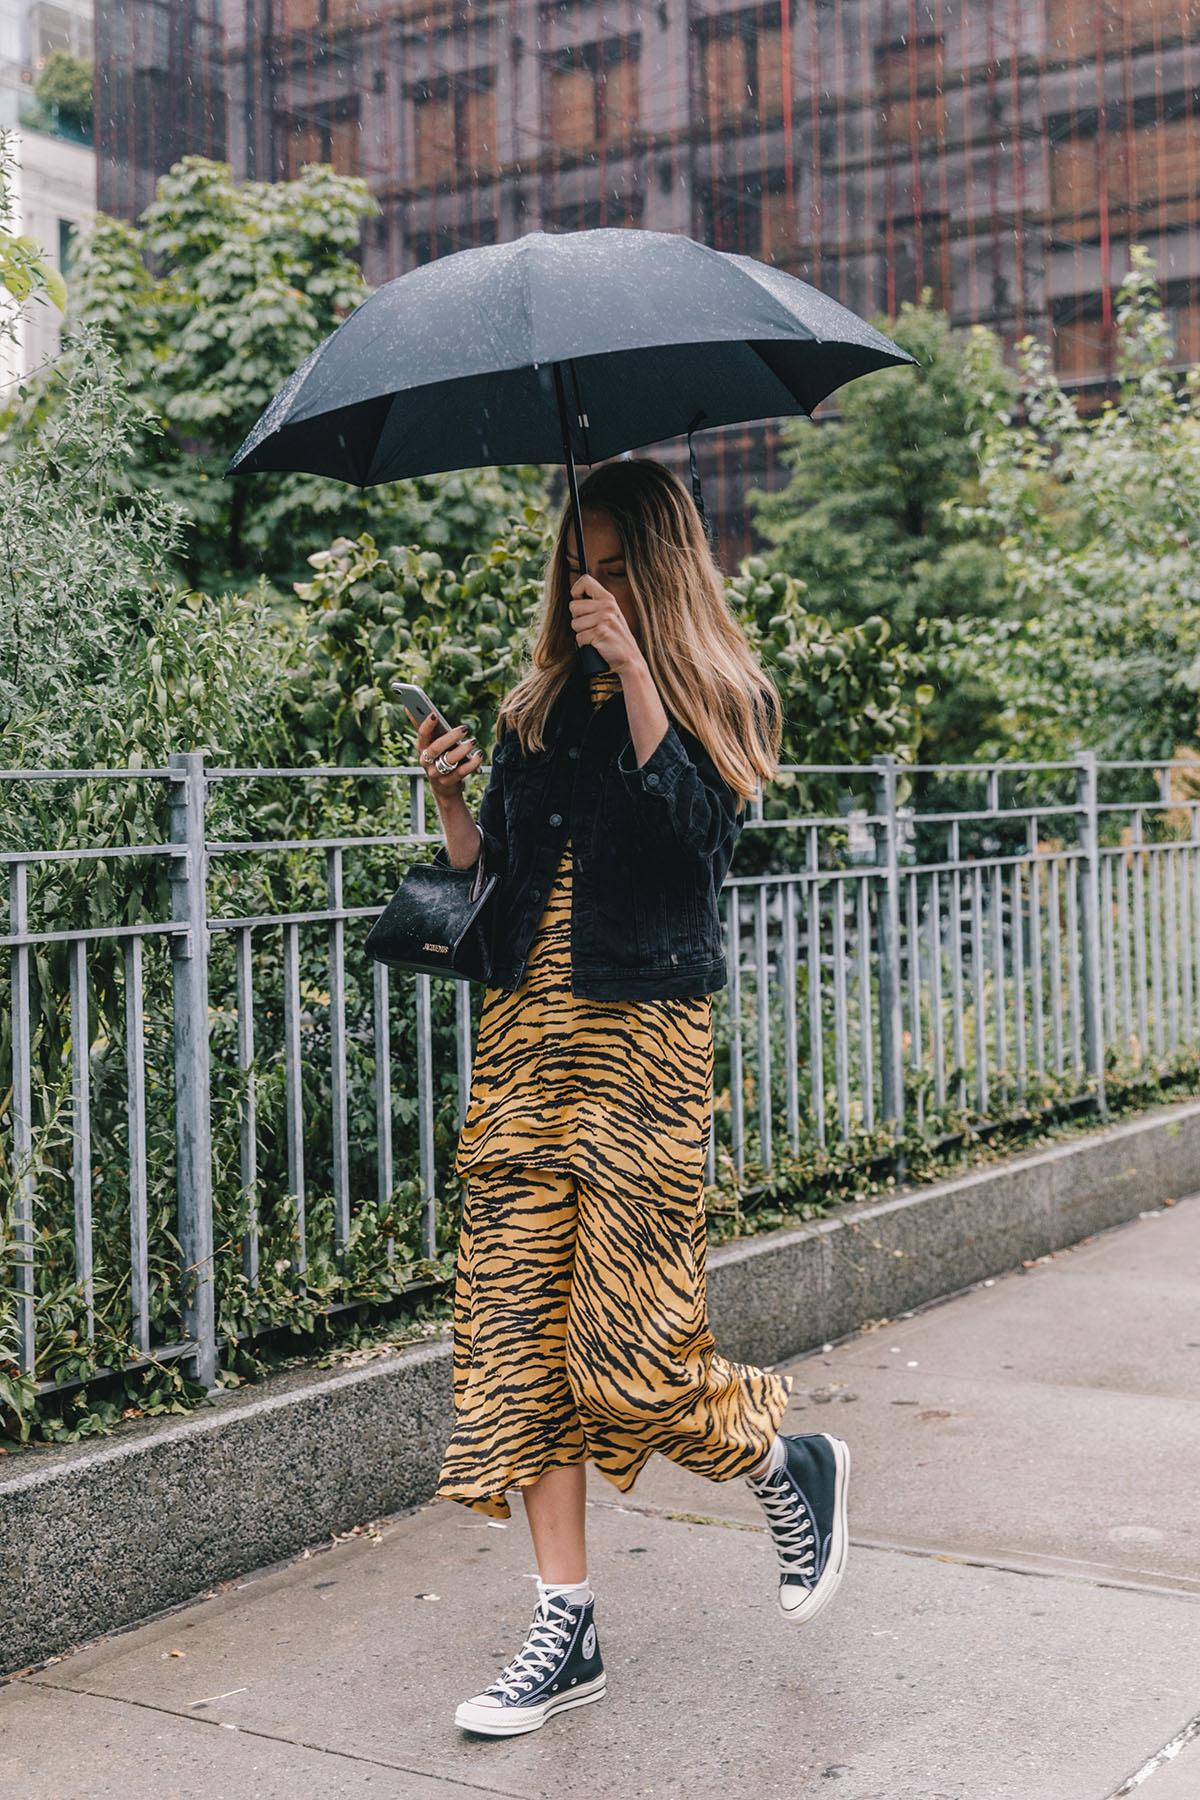 Stylish Rainy Outfit Idea — Animal Print Dress, Denim Jacket, and Converse Sneakers